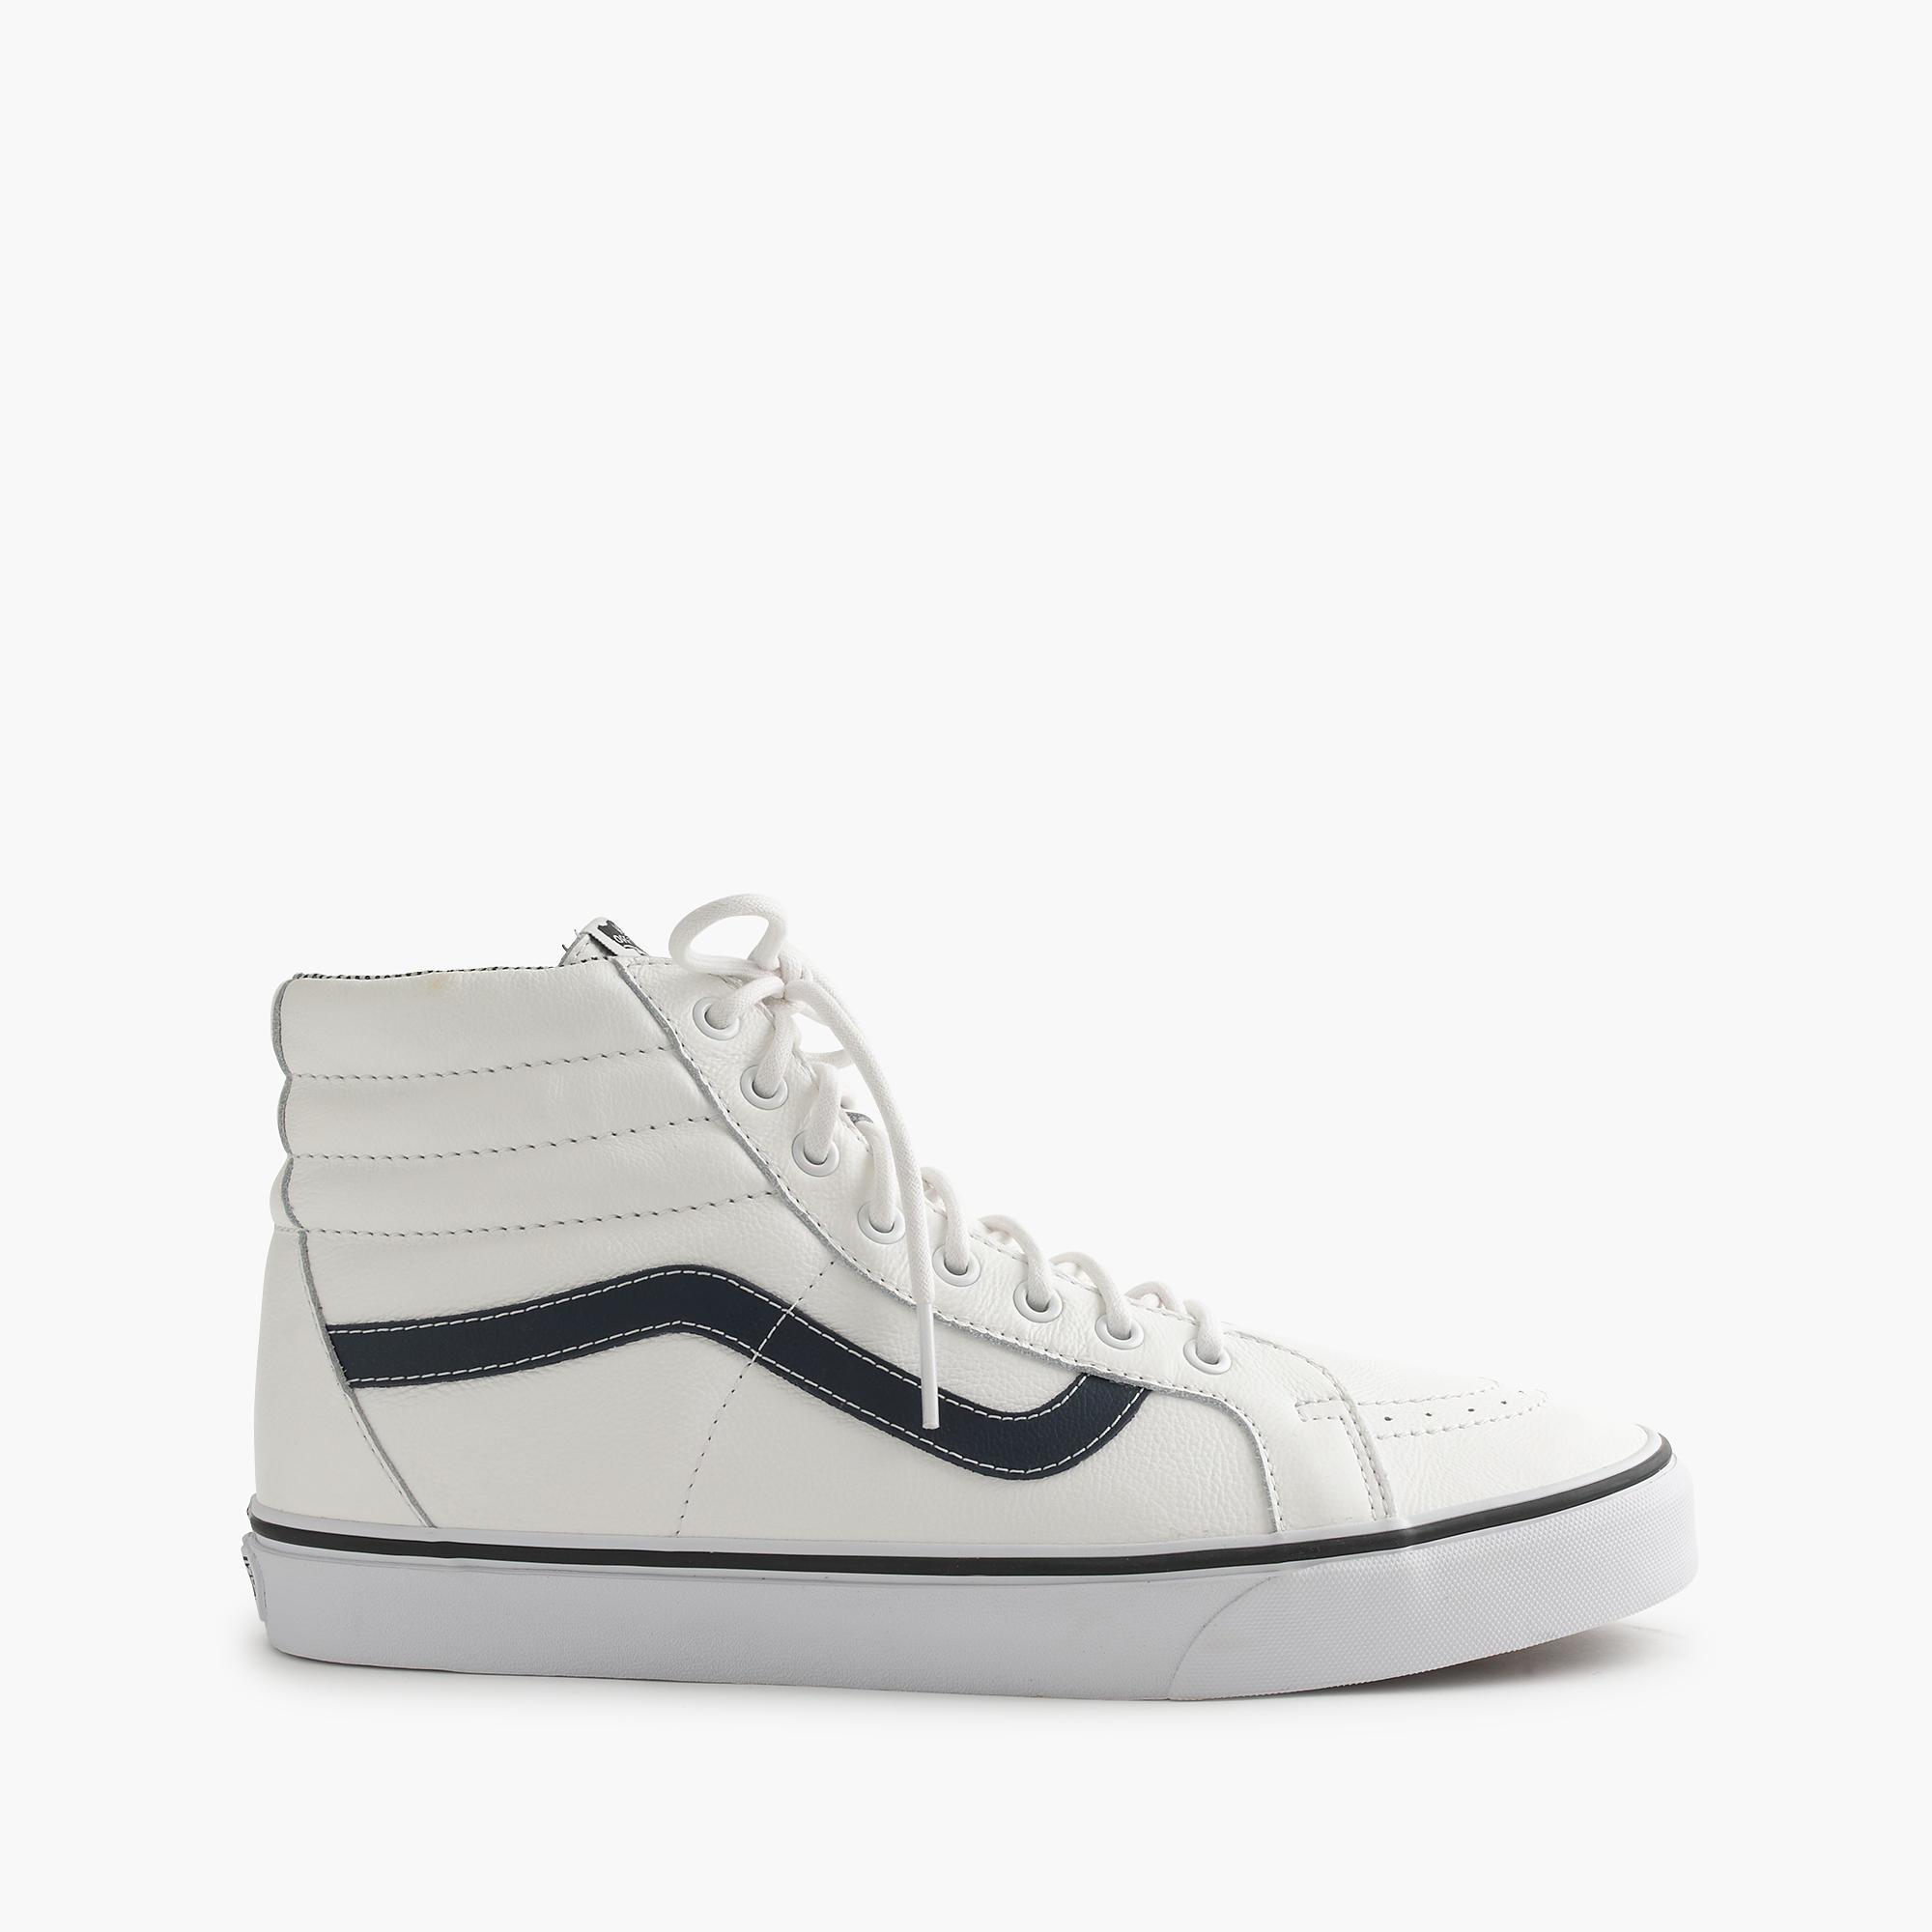 J.Crew Vans Sk8-hi Leather Sneakers in